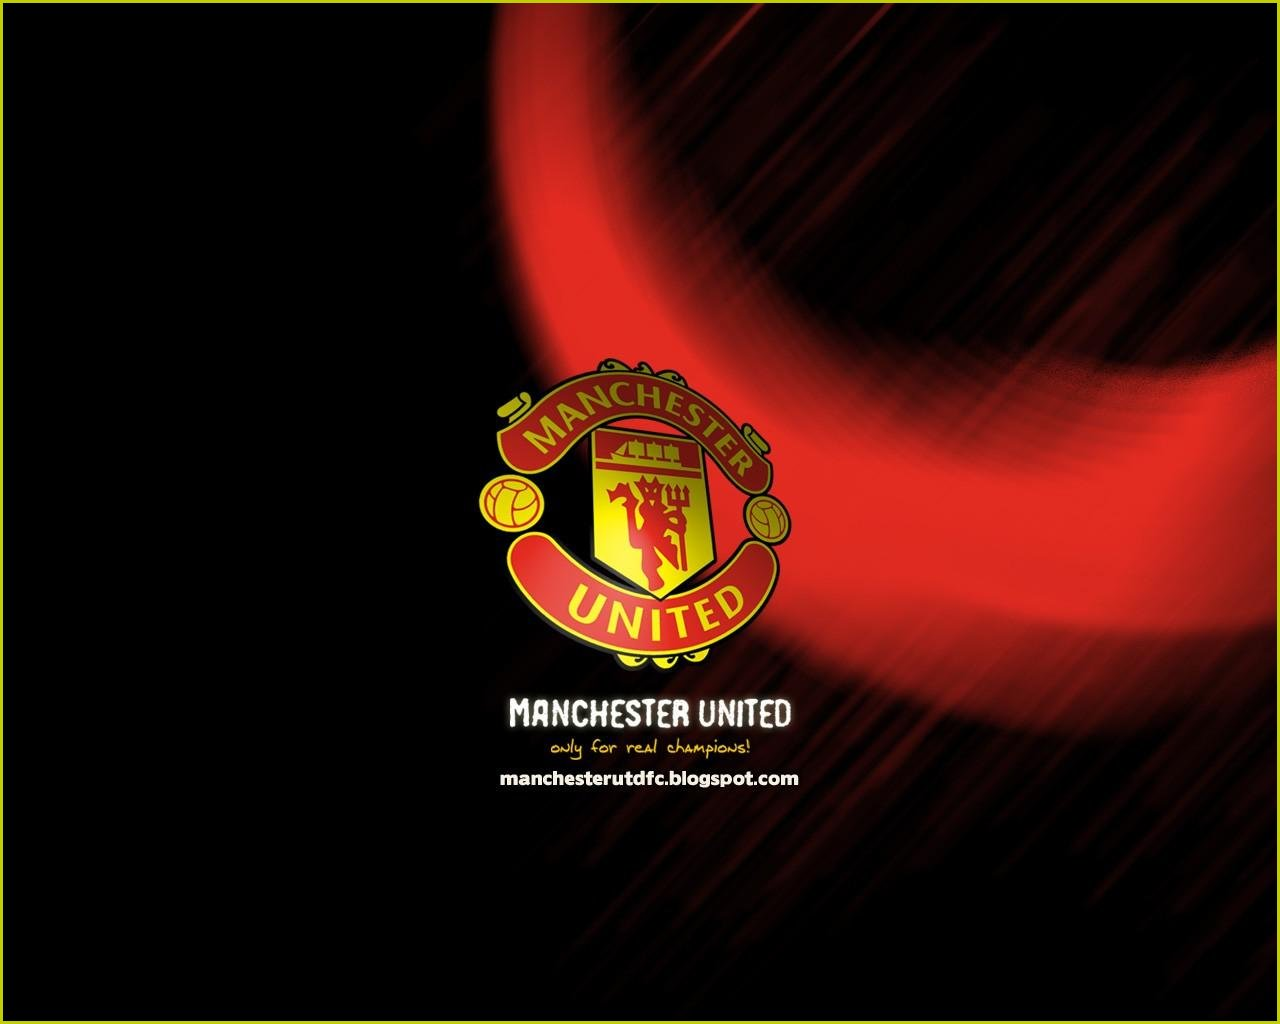 http://3.bp.blogspot.com/-uR6s4G-KIQA/UMiIWc0xXbI/AAAAAAAABlg/_o36W1MSnMY/s1600/manchester_united_logo_wallpaper_5.jpg